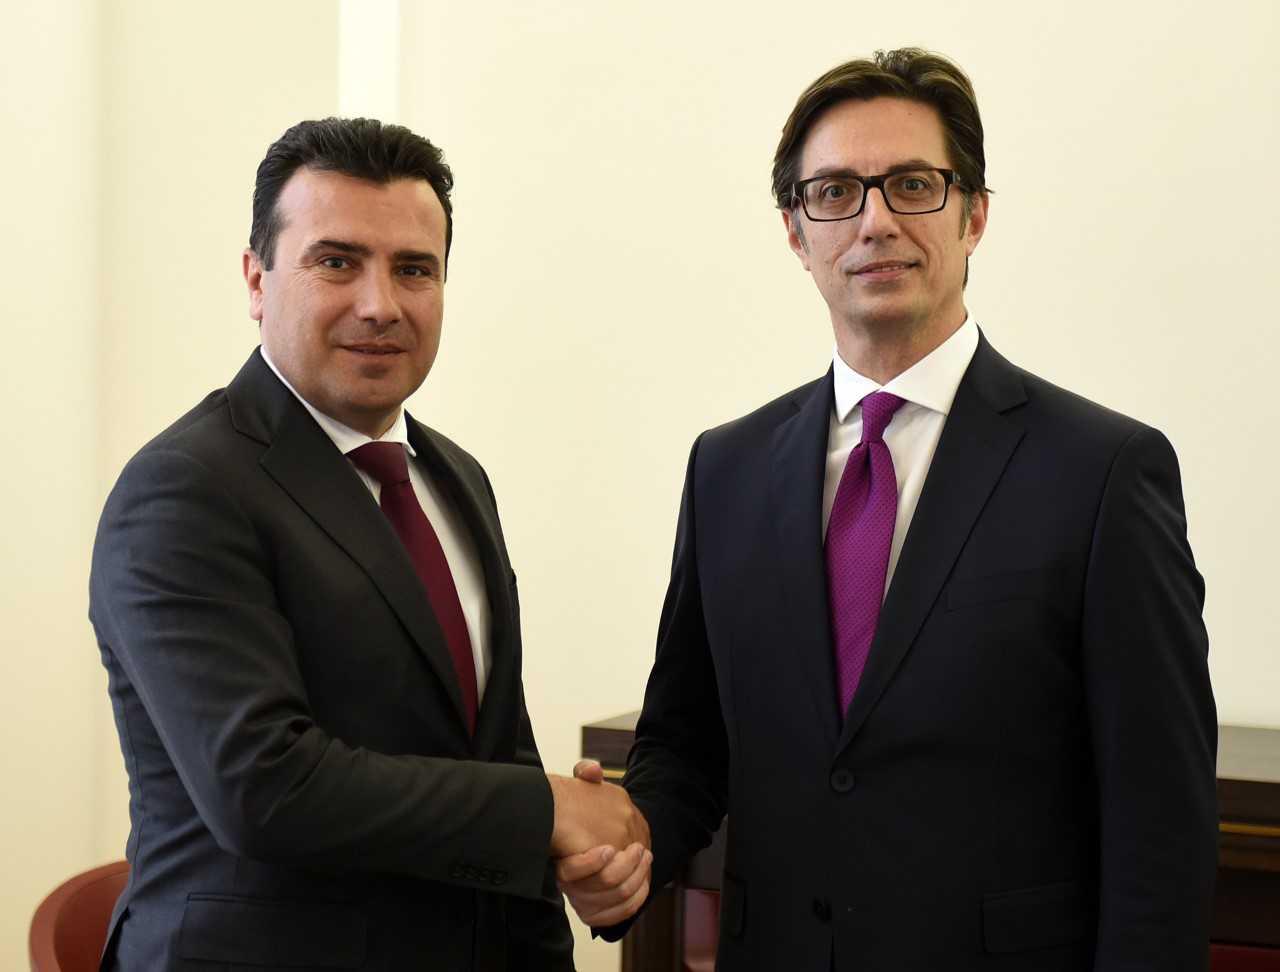 Zaev-Pendarovski, zajednički program spoljne  politike?